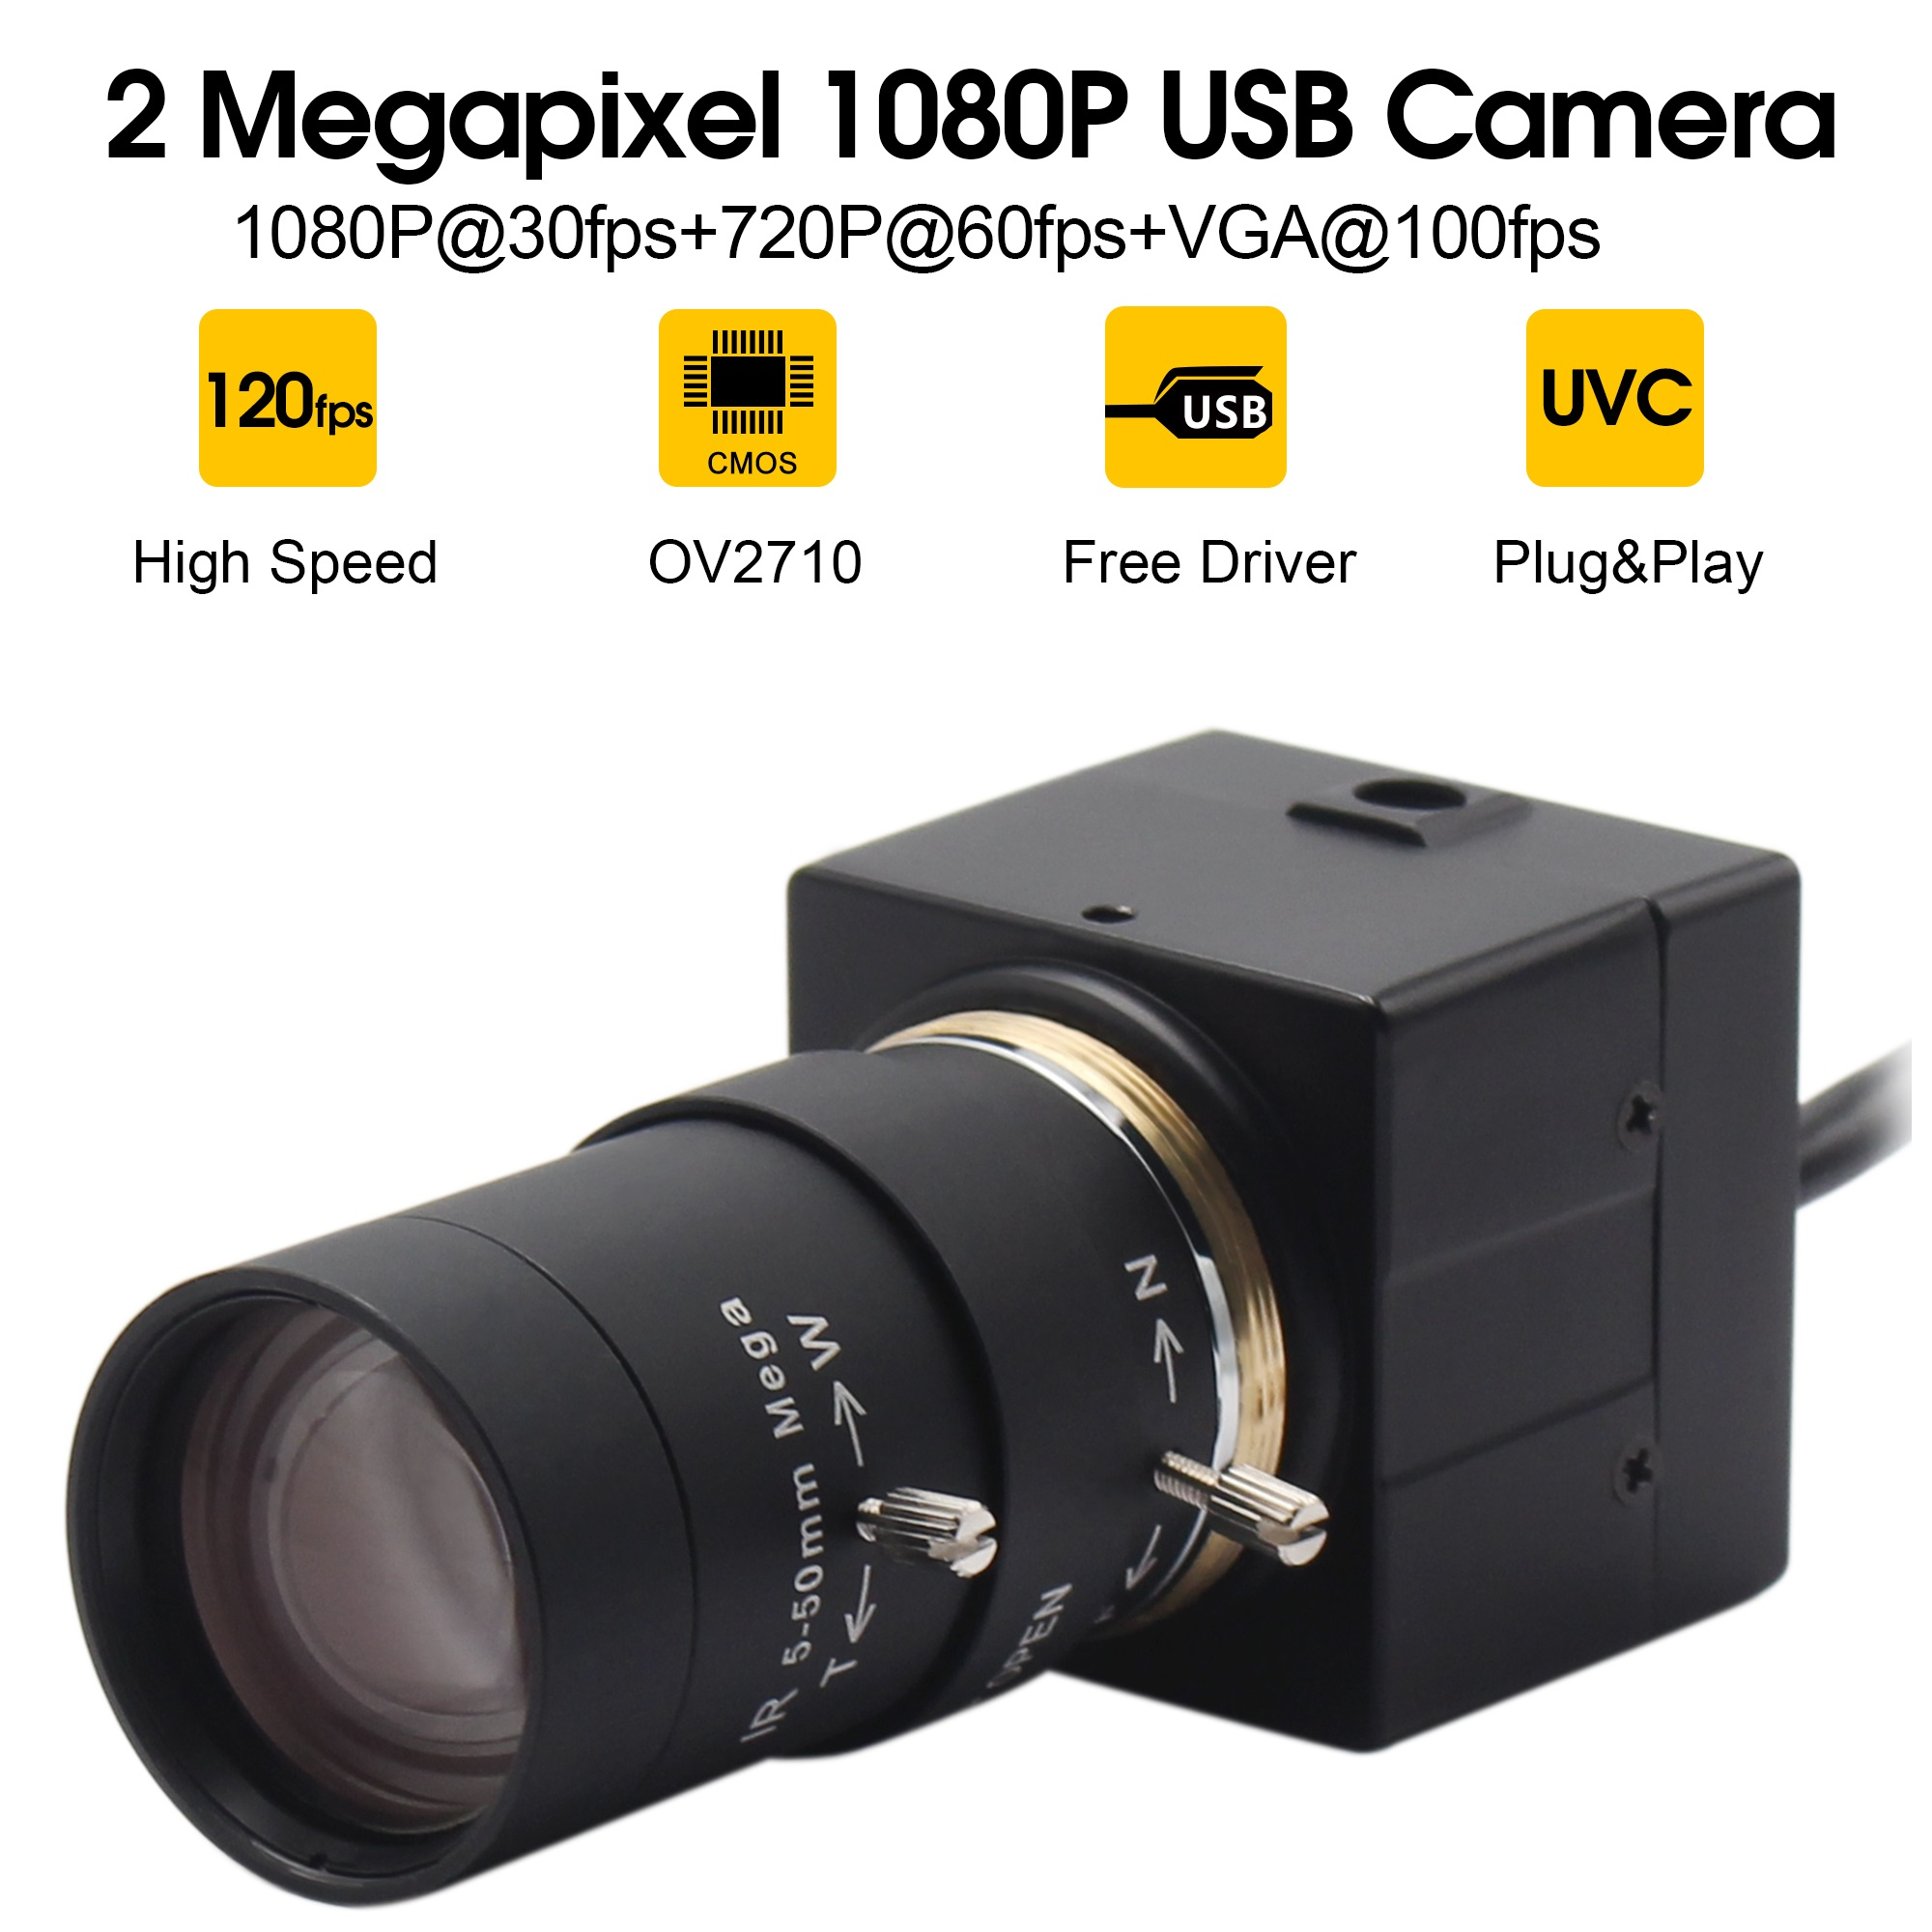 1080P USB Webcam 5 50mm CS Mount Varifocus lens CMOS OV2710 MJPEG 30fps/60fps/120fps USB Camera chamber for Computer PC Laptops-in Webcams from Computer & Office    1